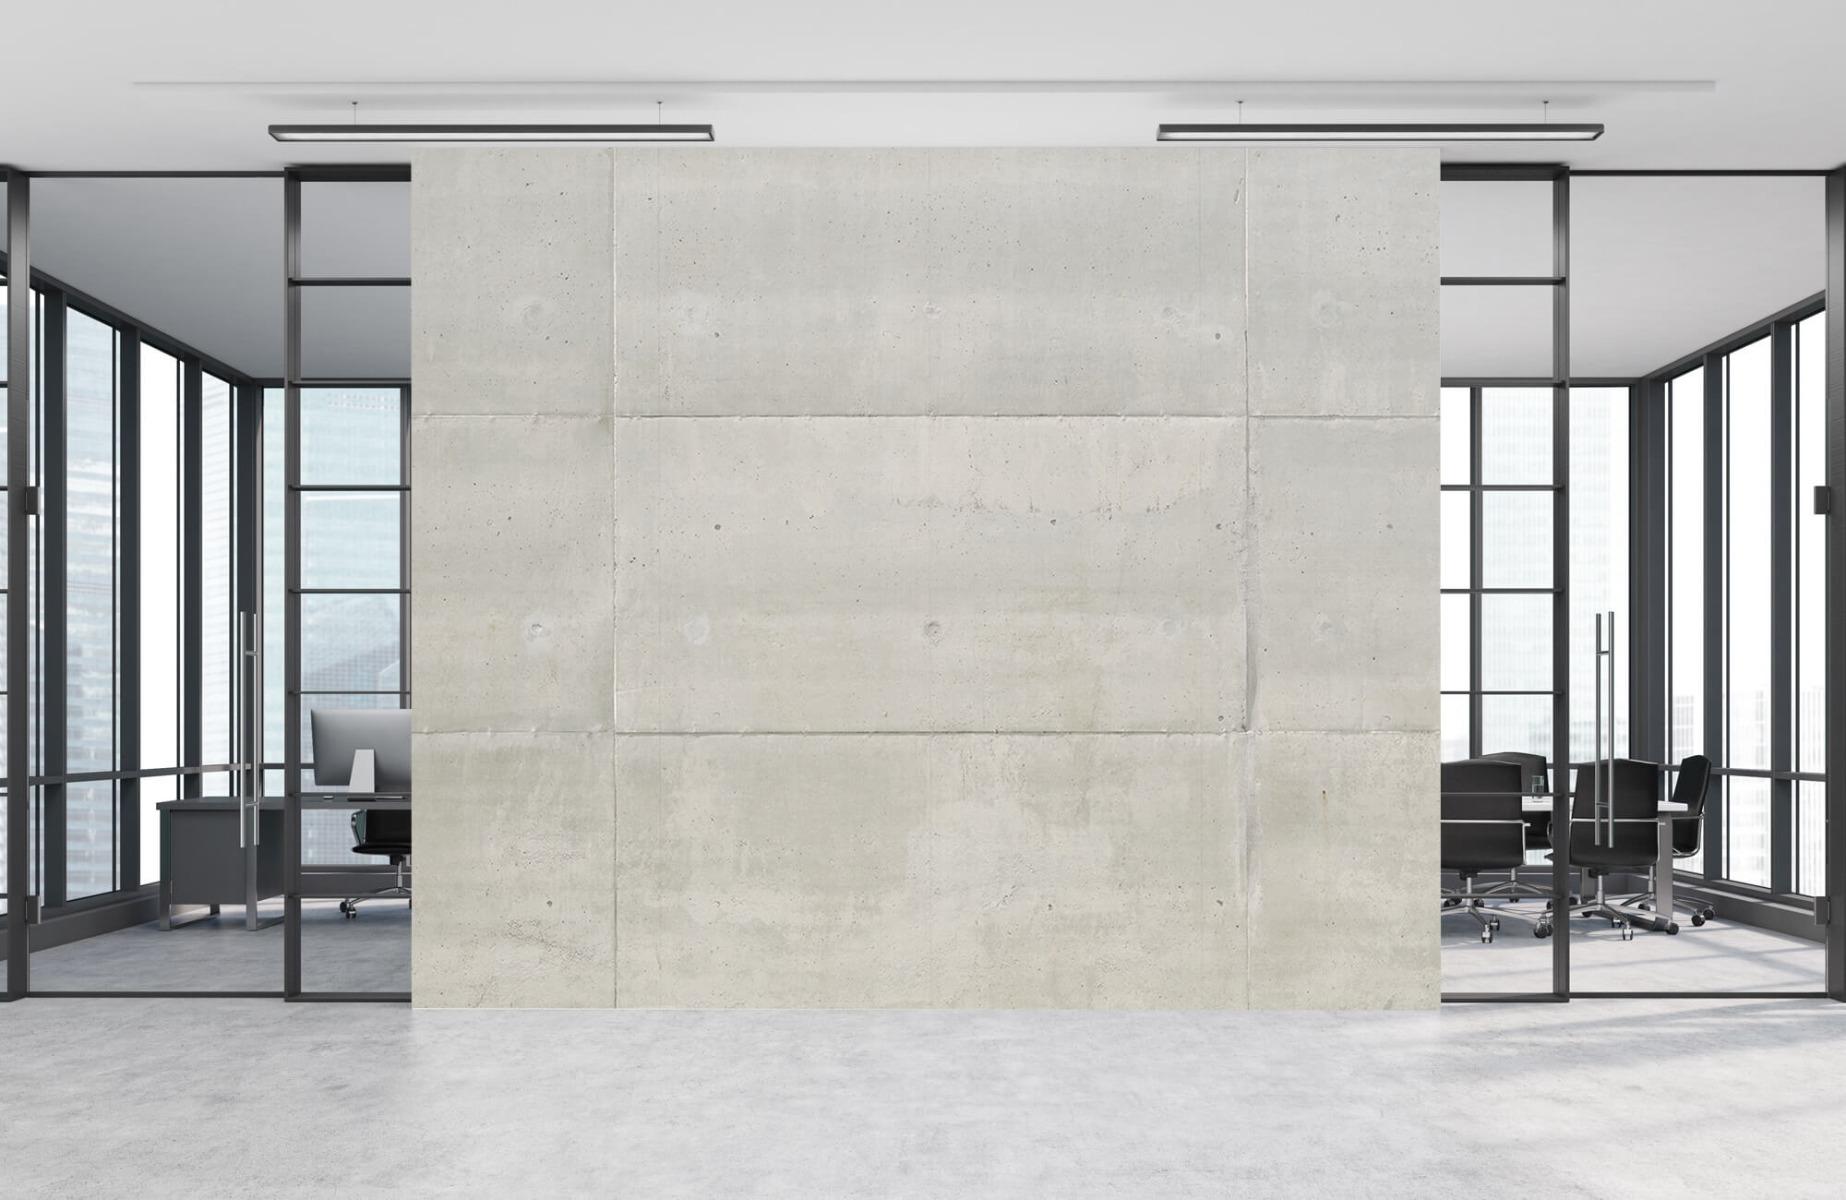 Betonlook behang - Betonnen platen - Wallexclusive - Vergaderruimte 12